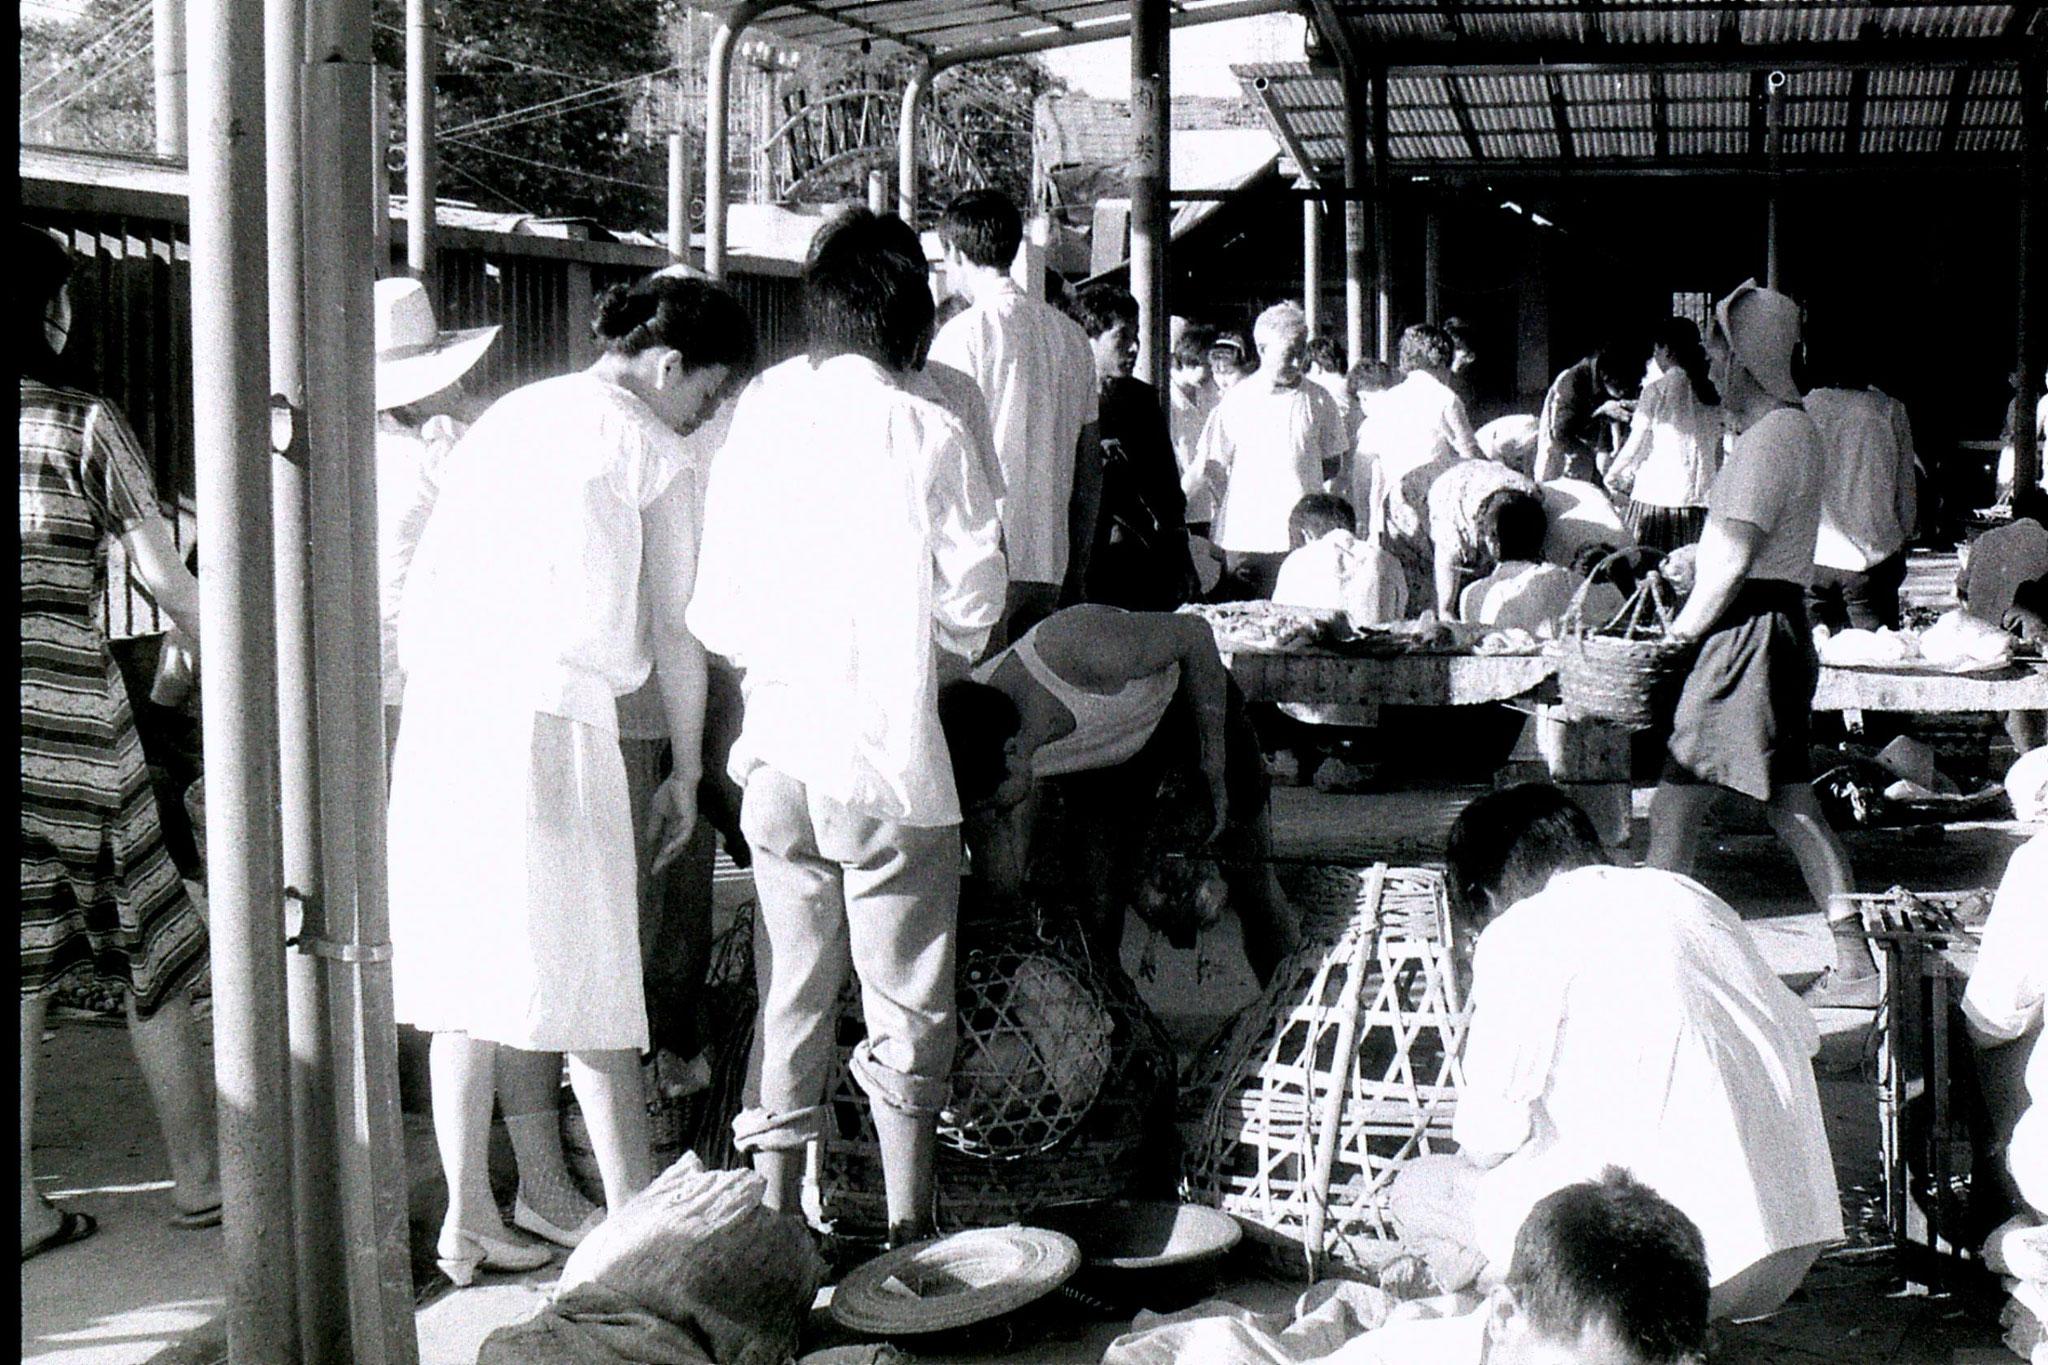 19/7/1989: 34: Zheda Free market